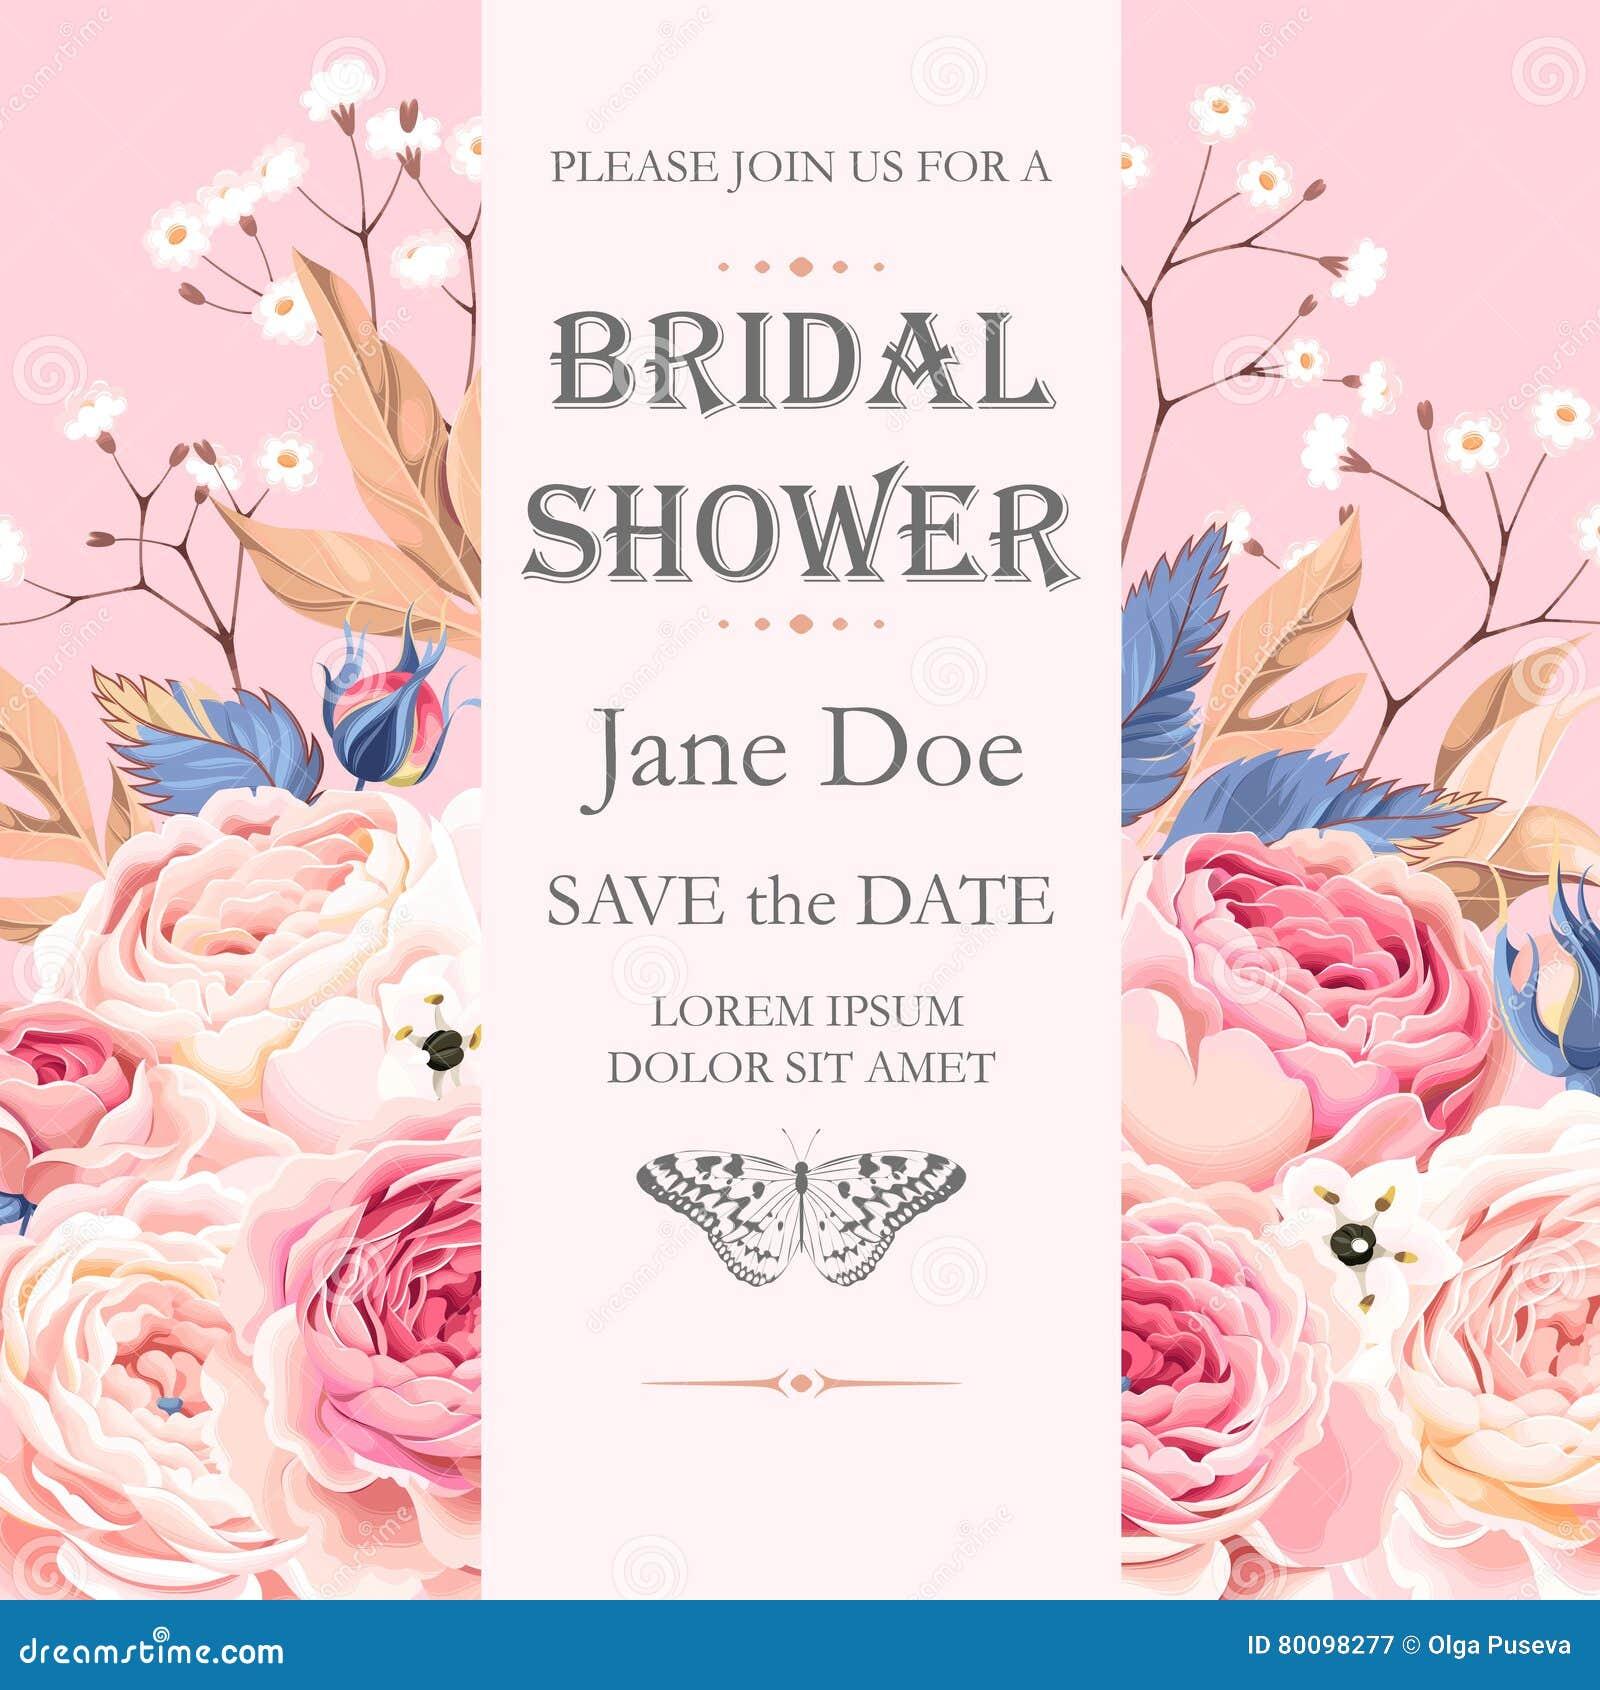 Bridal shower invitation stock vector illustration of frame 80098277 bridal shower invitation royalty free vector stopboris Image collections